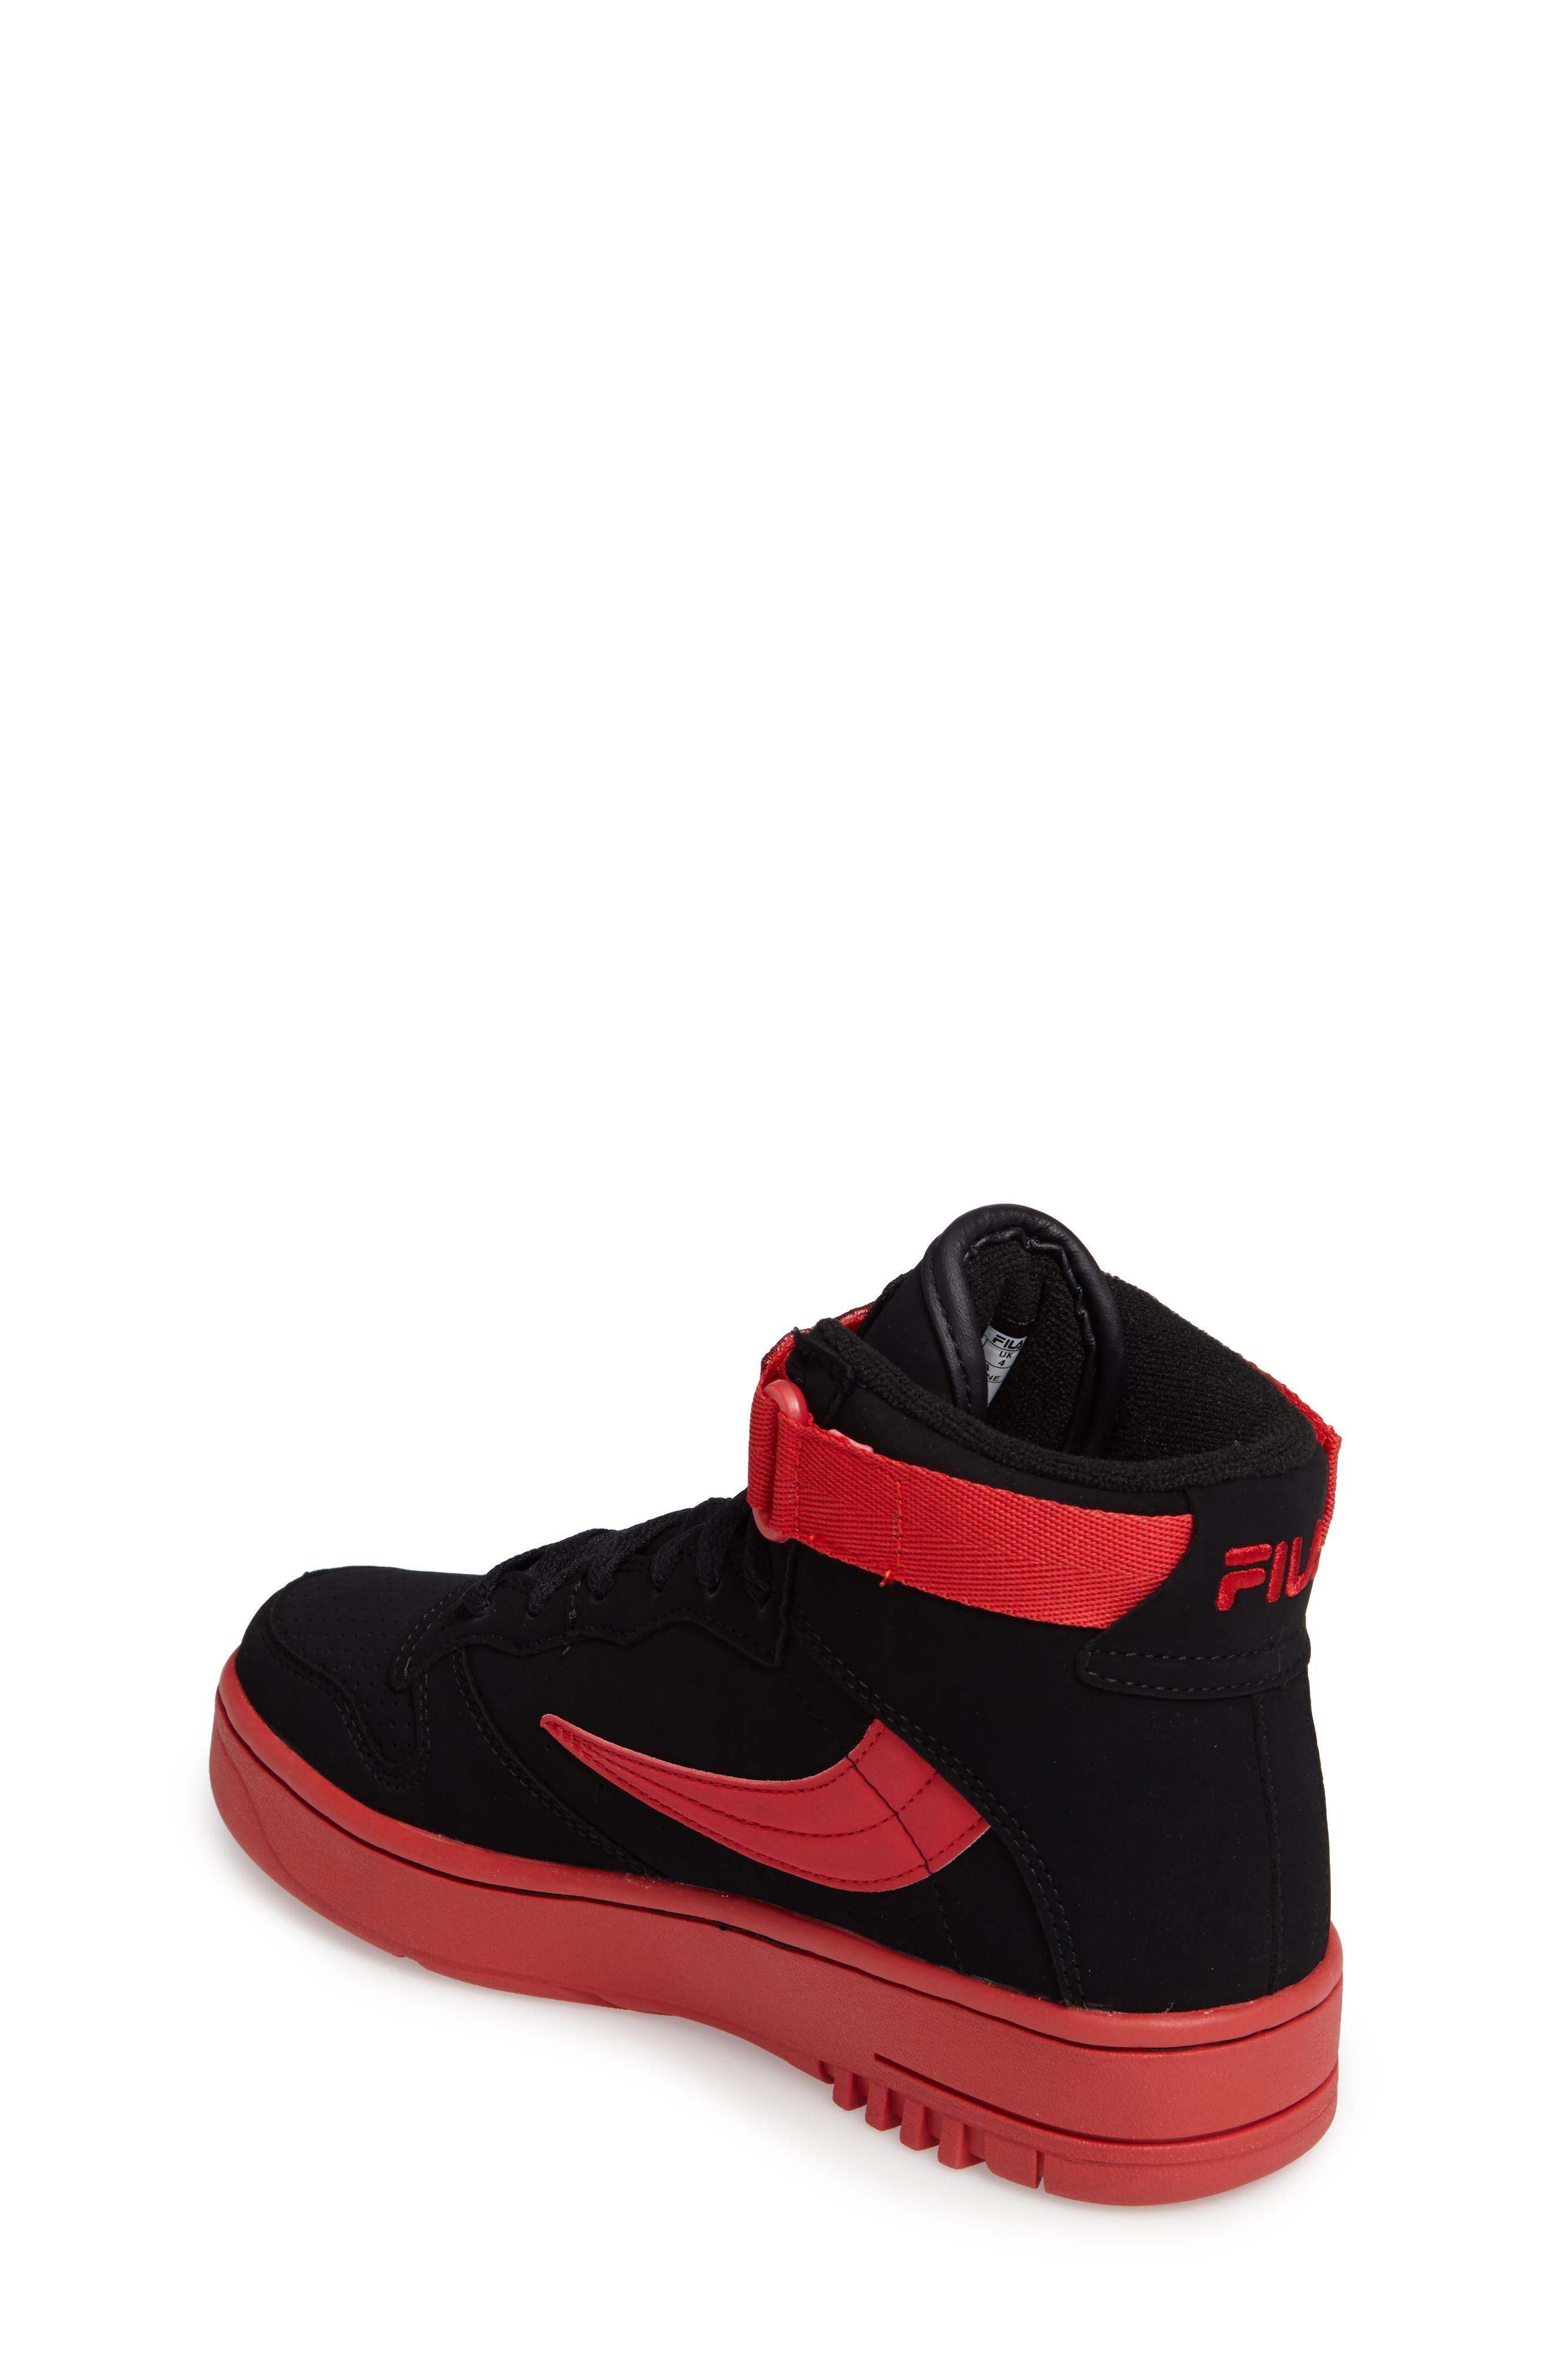 USA FX-100 High Top Sneaker,                             Alternate thumbnail 3, color,                             001